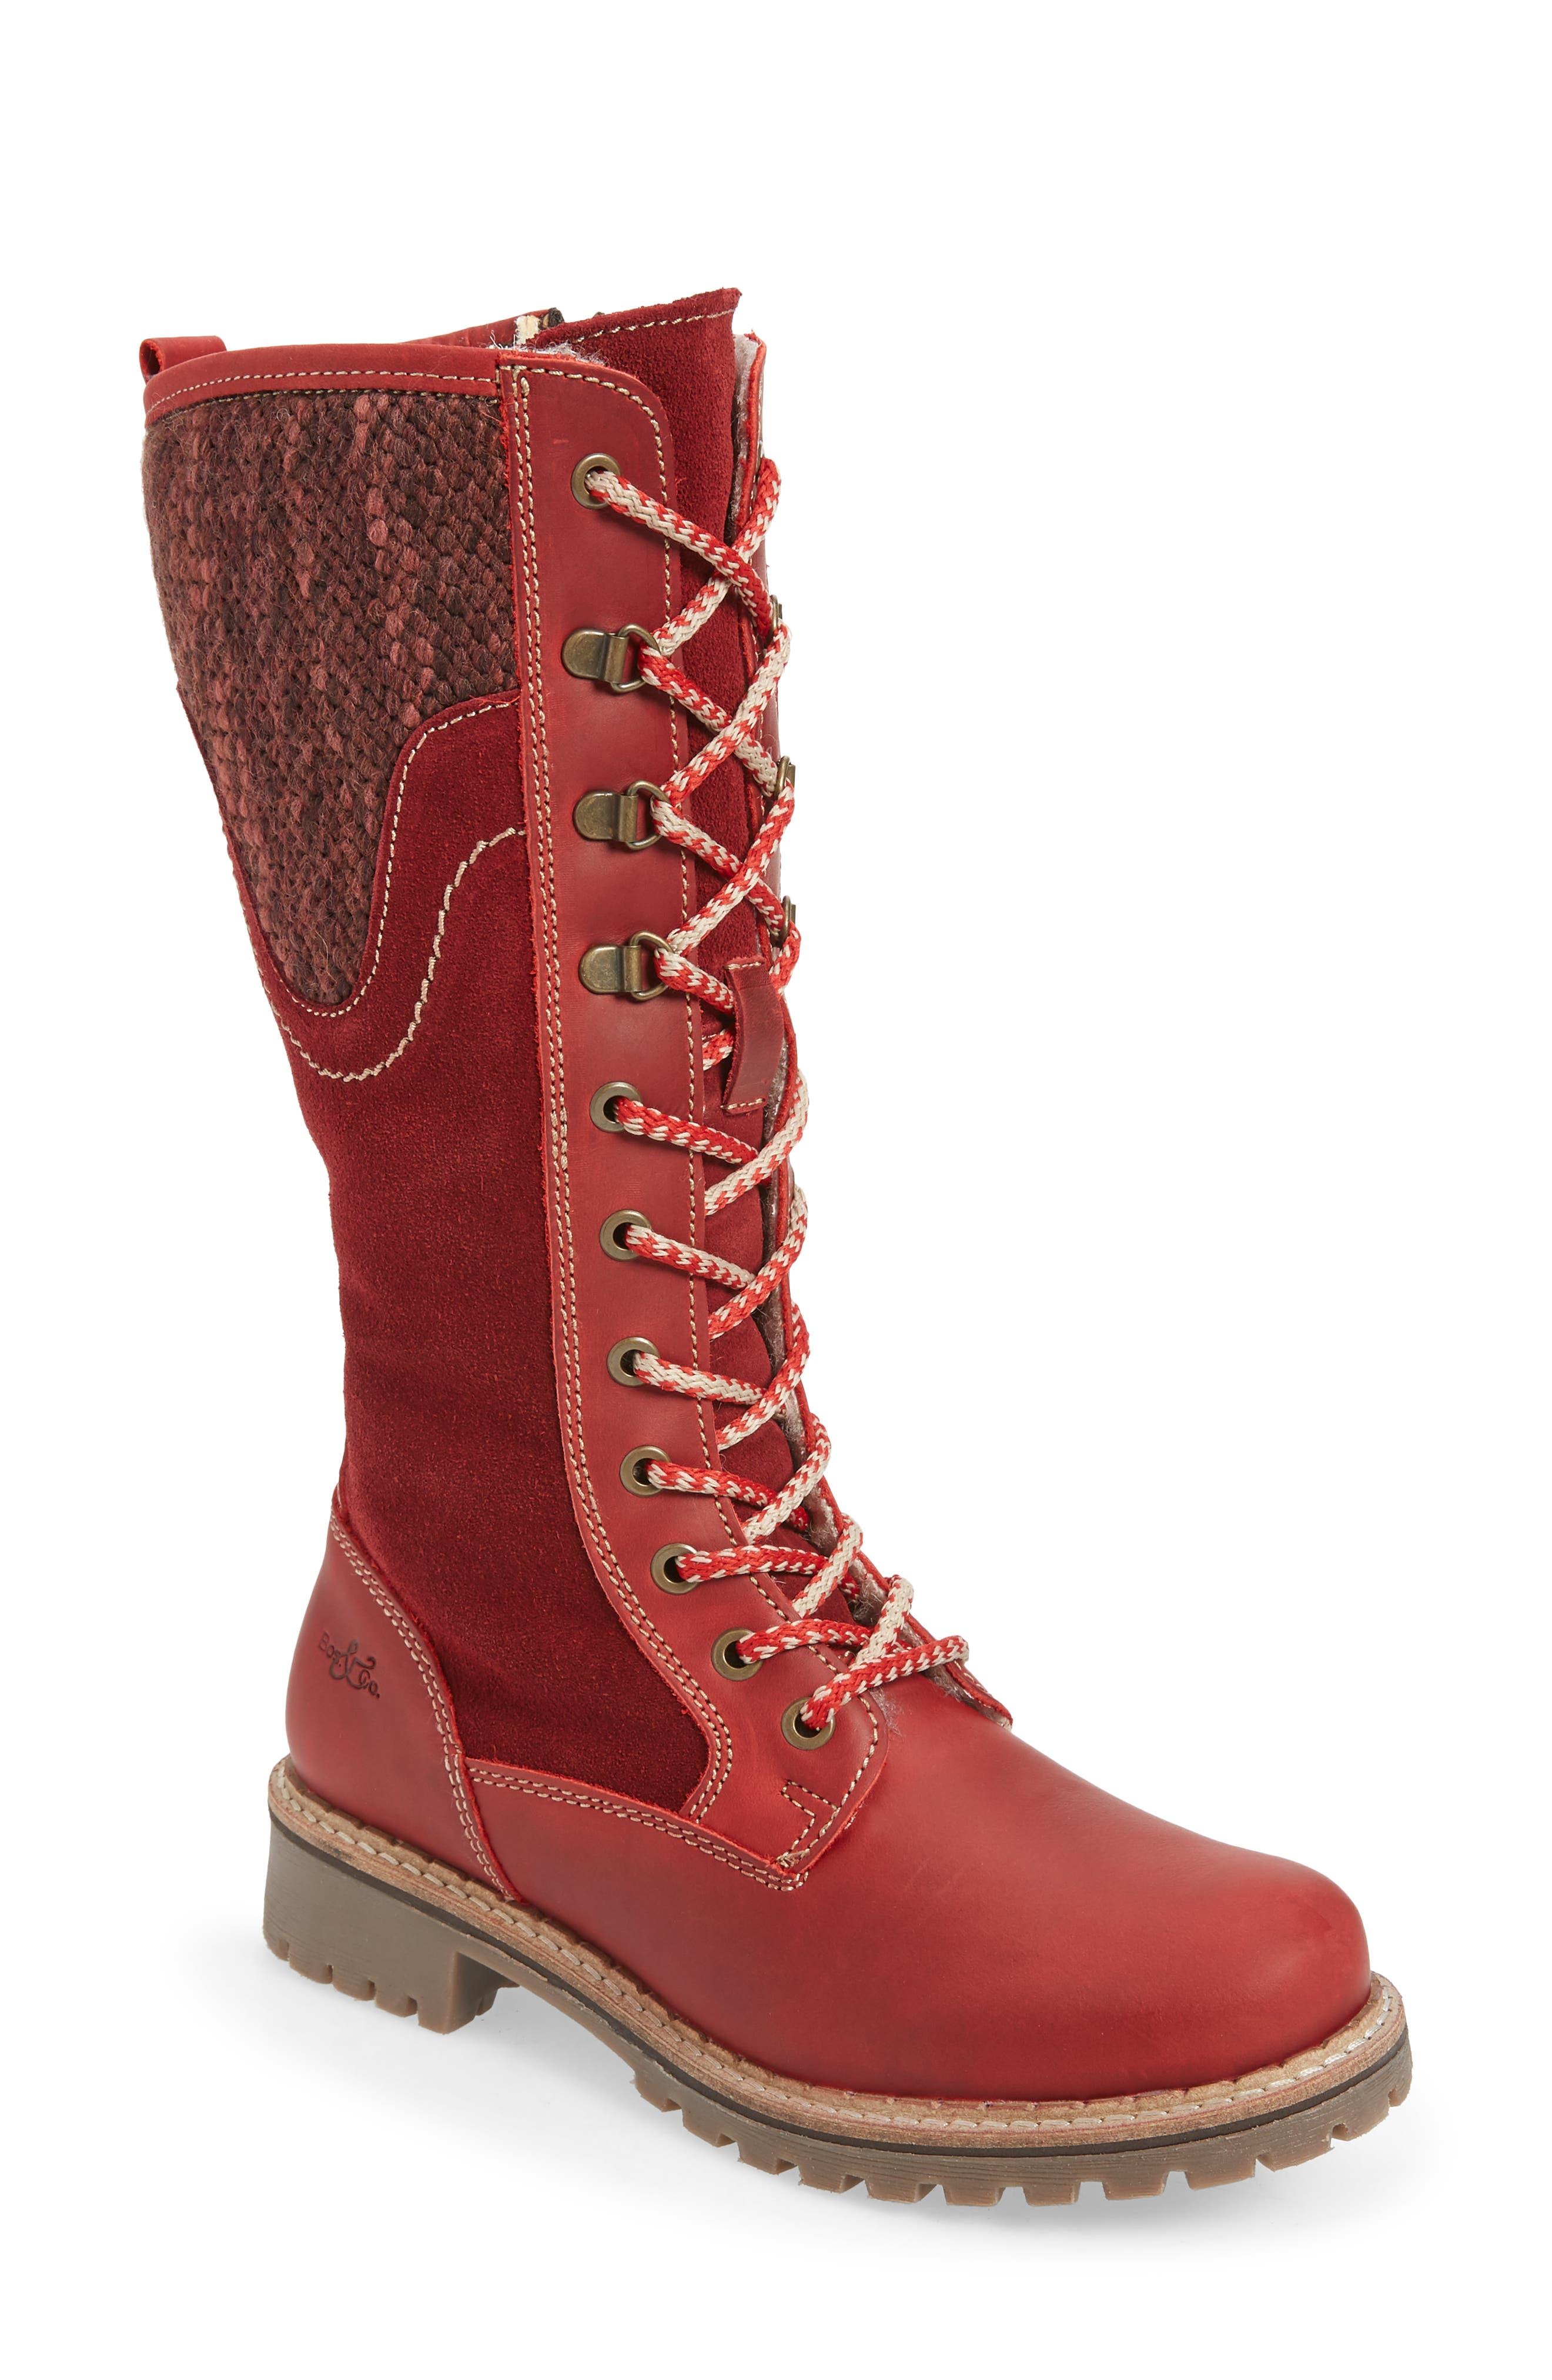 Hayday Tall Waterproof Hiker Boot